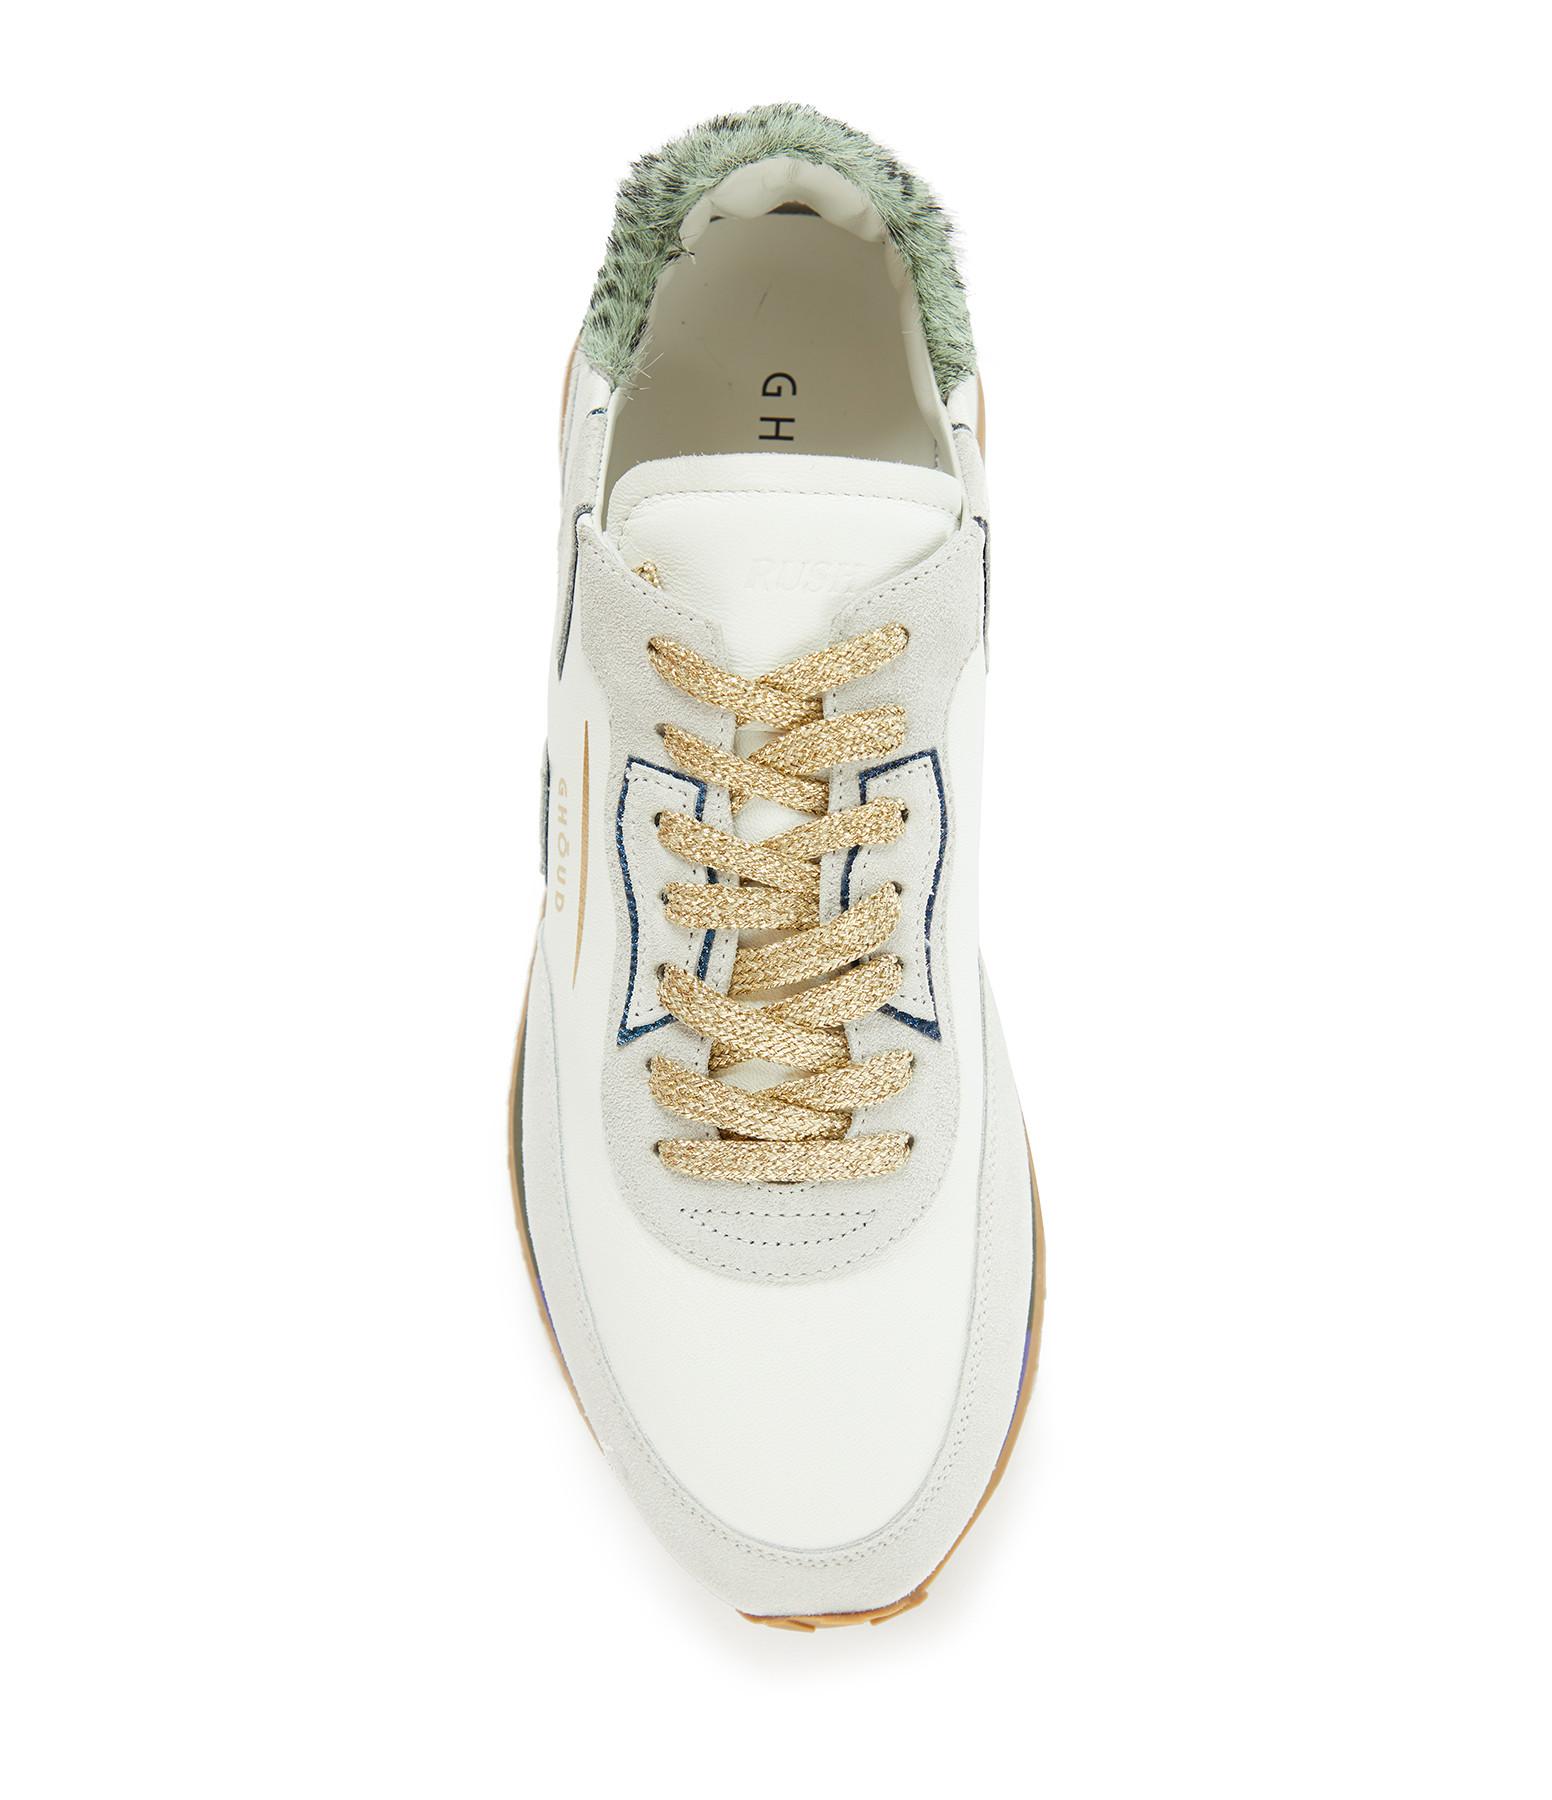 GHOUD VENICE - Baskets Running Rush Cuir Blanc Vert